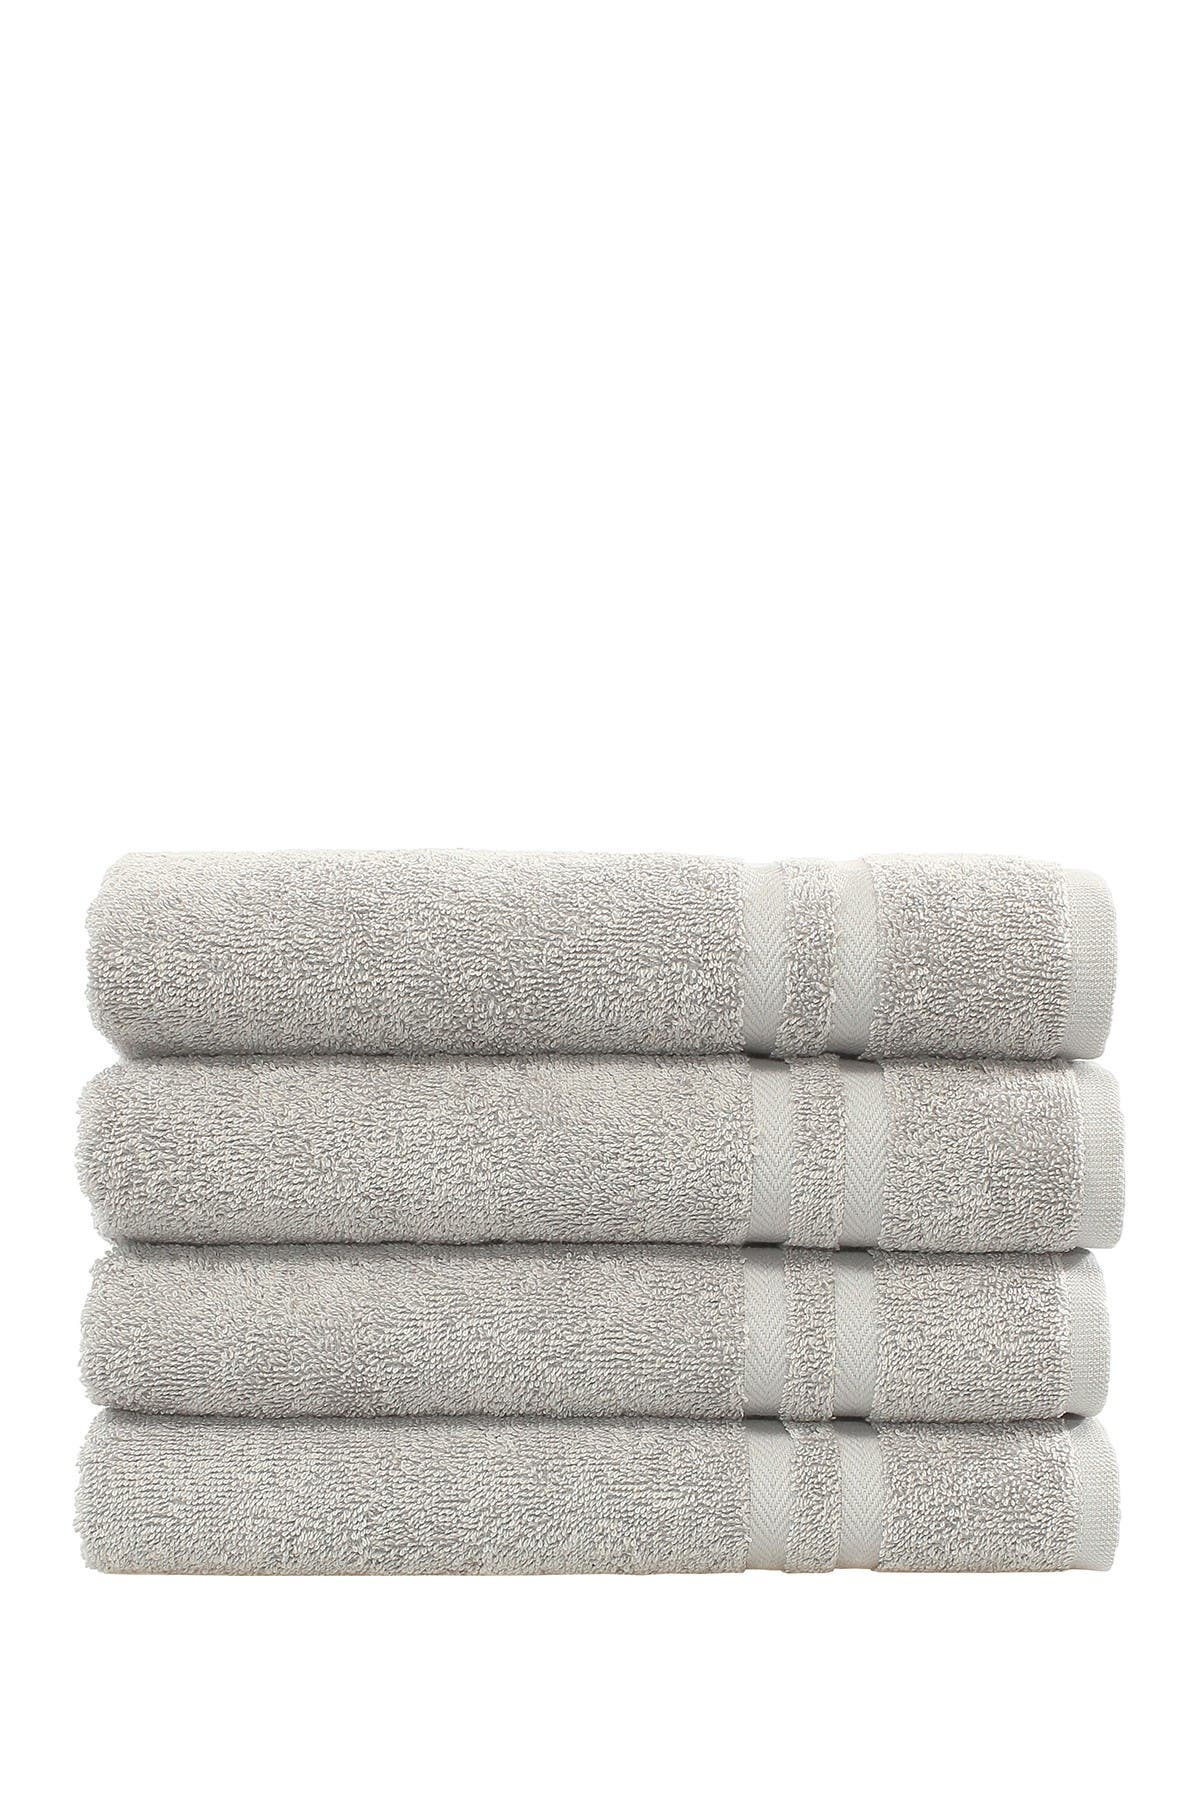 Image of LINUM HOME Denzi Hand Towels - Set of 4 - Grey